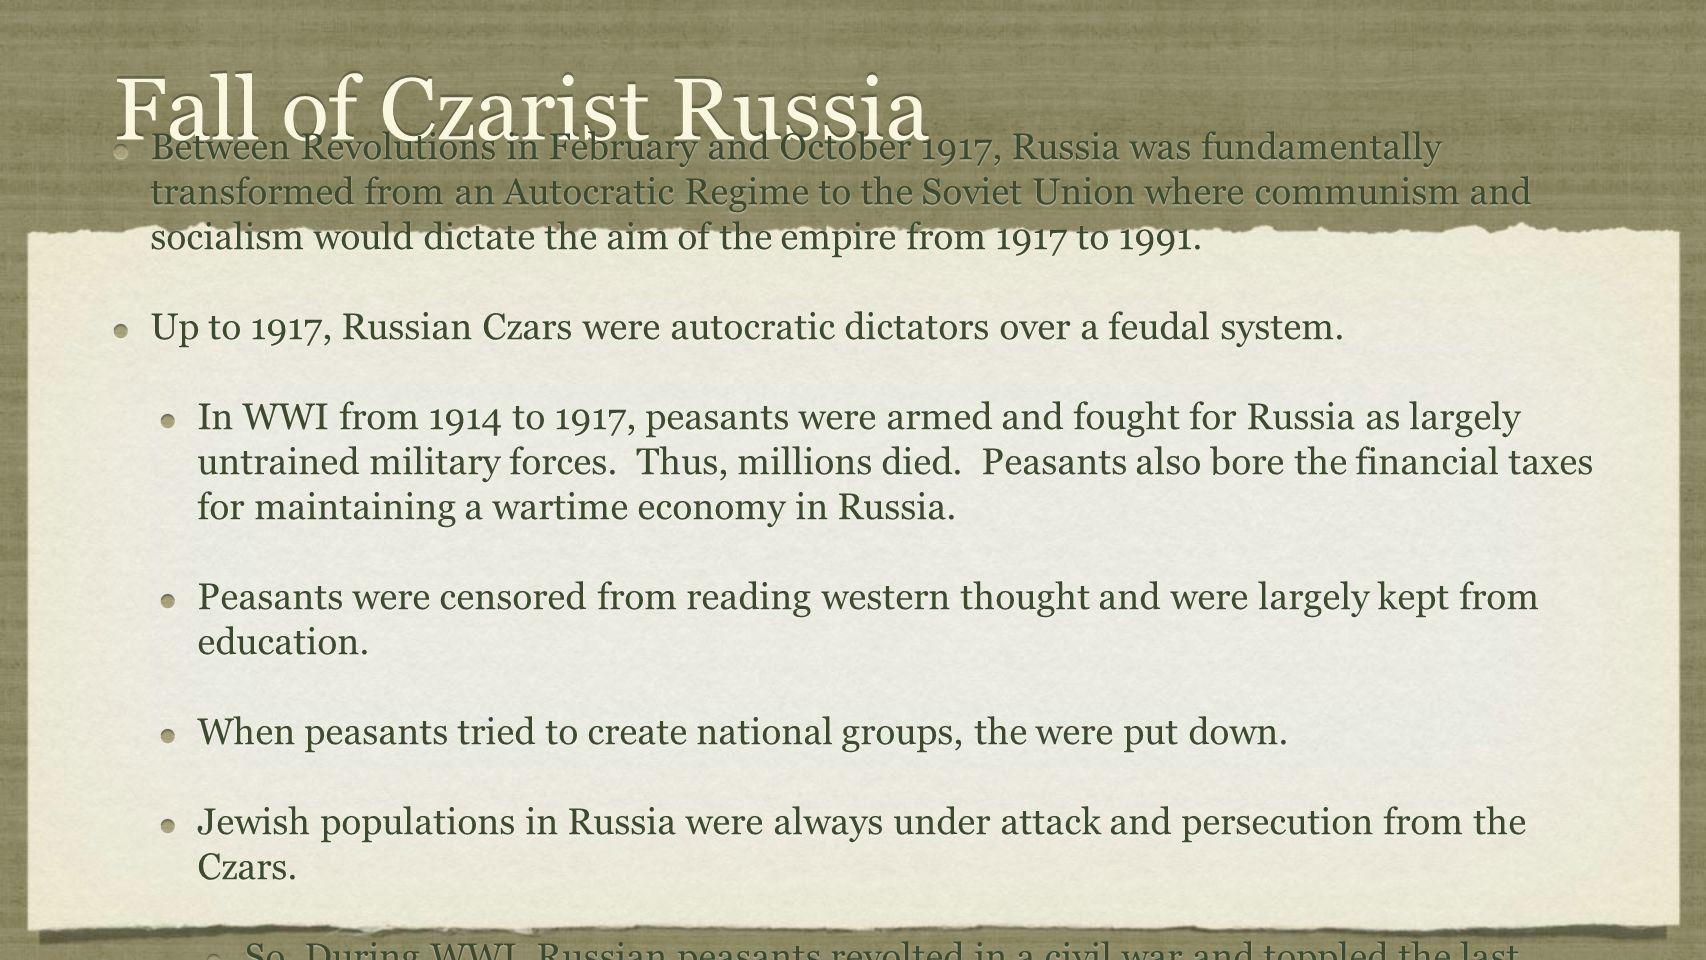 Fall of Czarist Russia